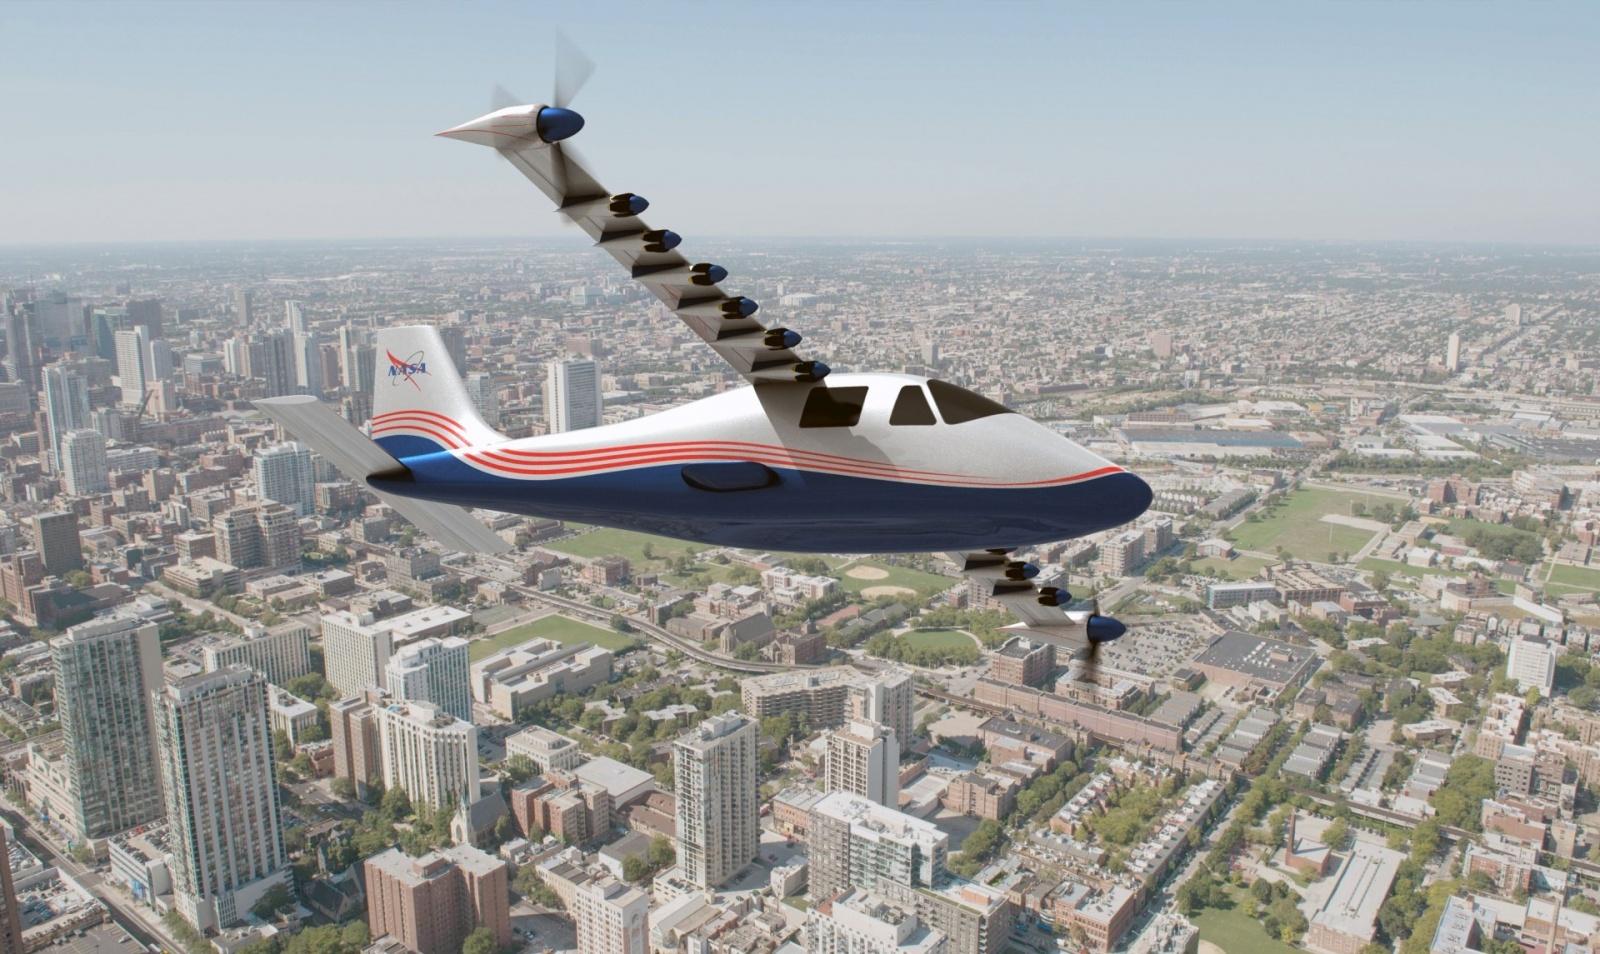 НАСА анонсировало электрический самолёт X-57 Maxwell - 1